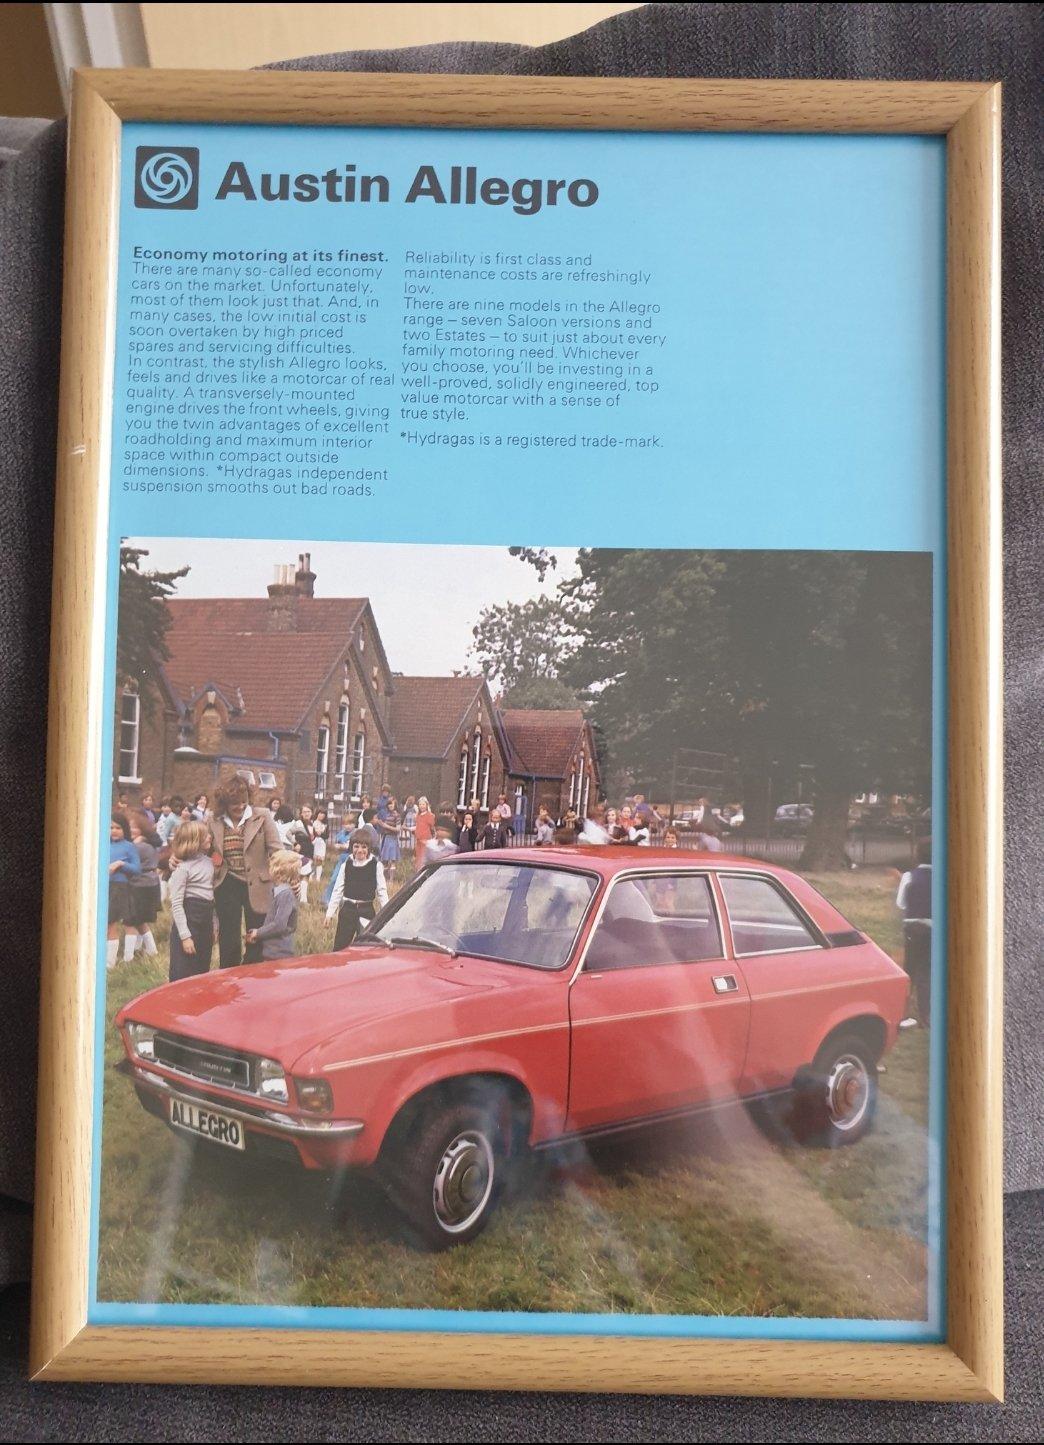 1978 Original Austin Allegro Framed Advert For Sale (picture 1 of 2)